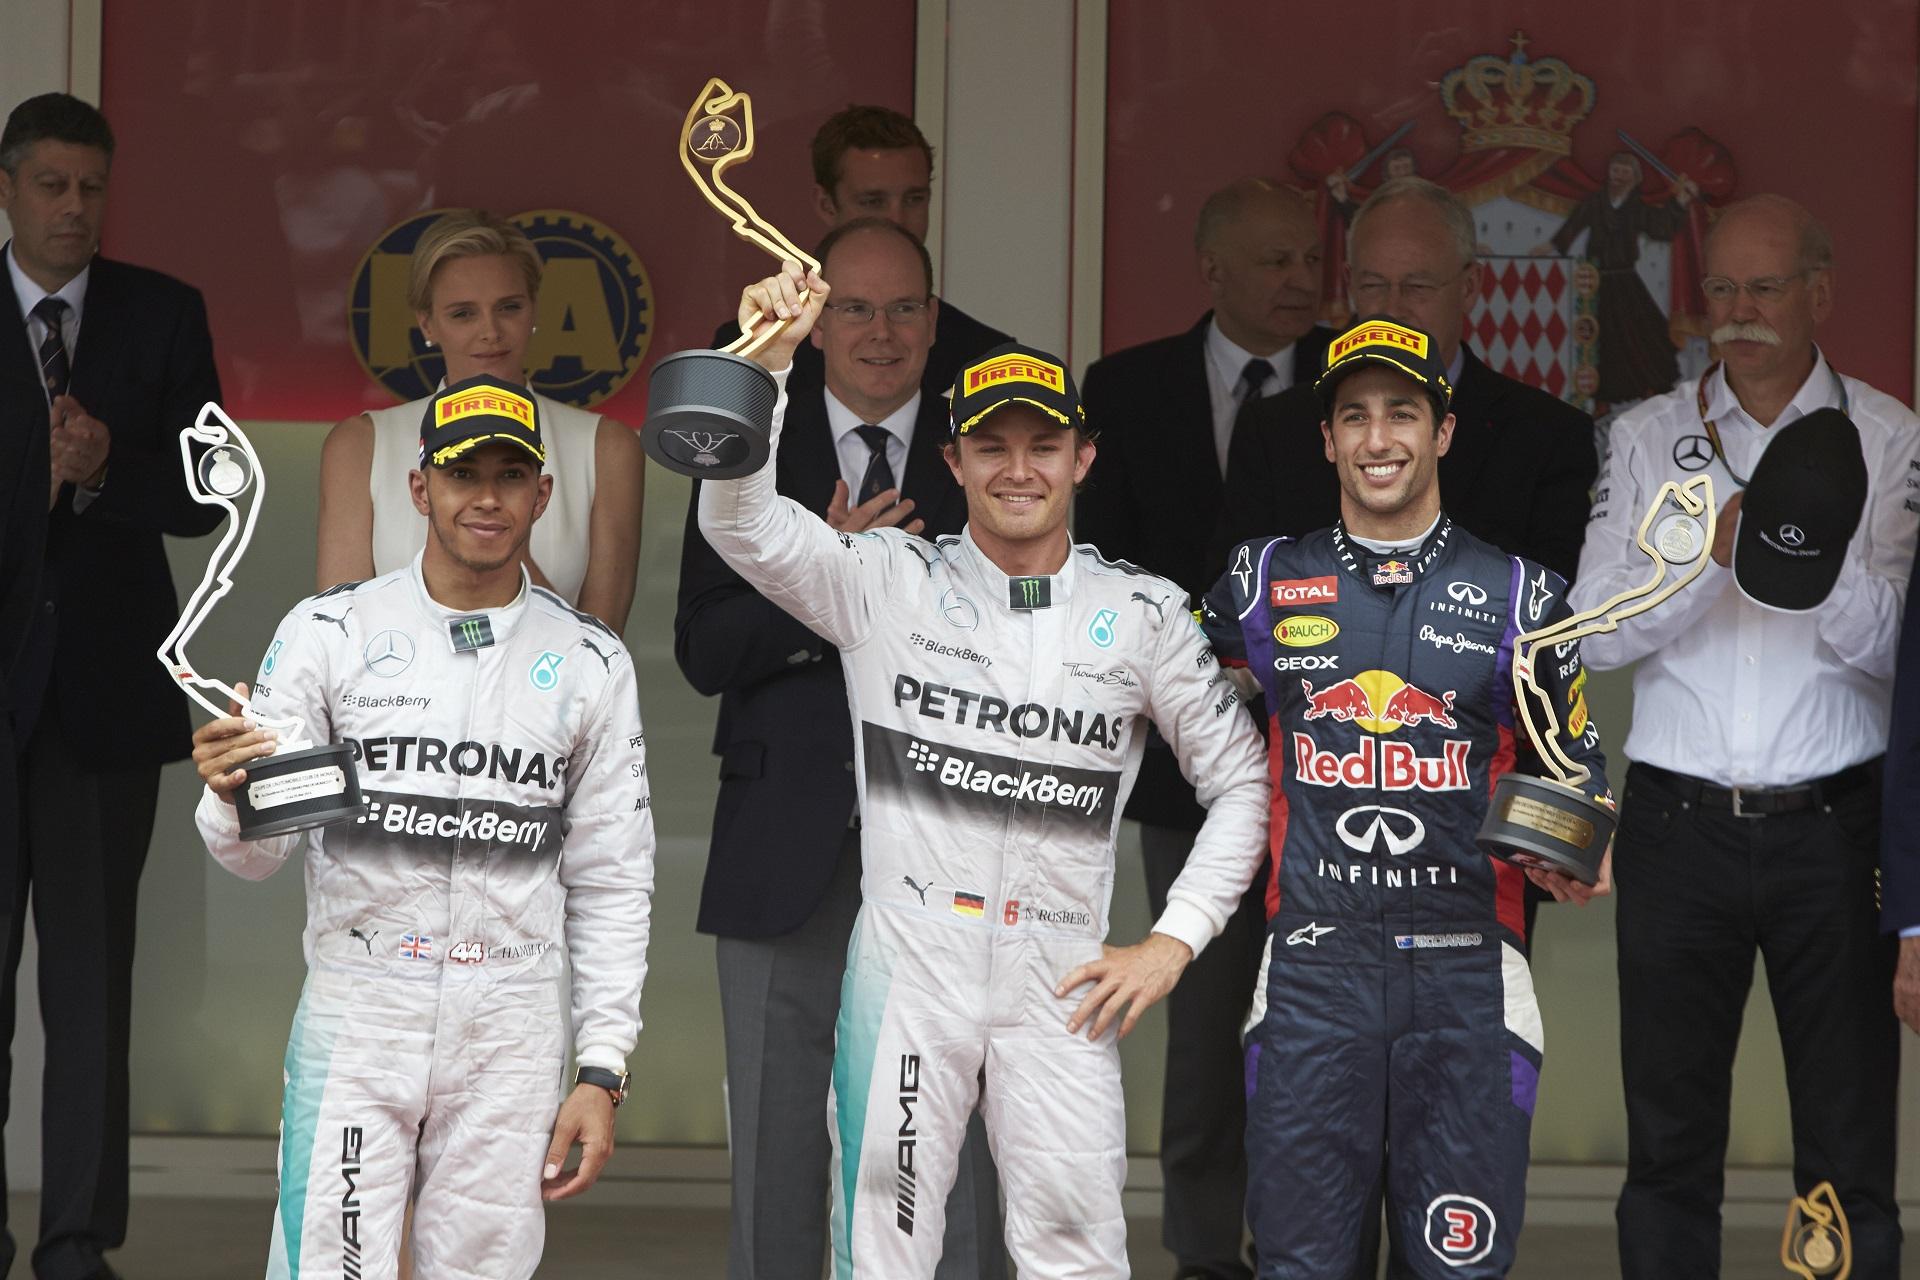 Monaco Podium - Mercedes AMG Petronas Media.jpg